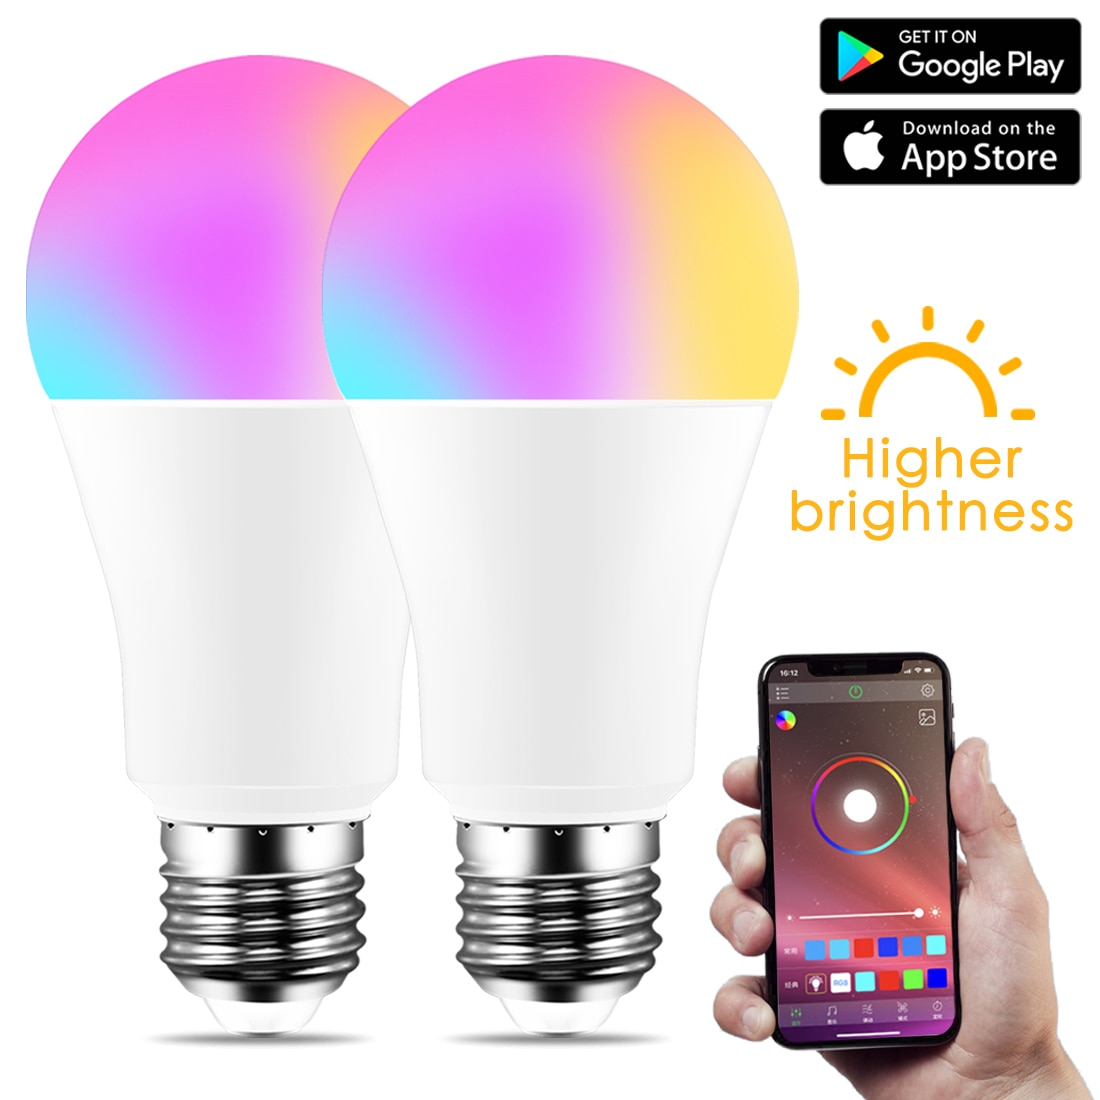 Neue Drahtlose Bluetooth 4,0 Smart Birne hause Beleuchtung lampe 10W E27 Magie RGB + W LED Farbe ndern Licht birne Dimmbar IOS